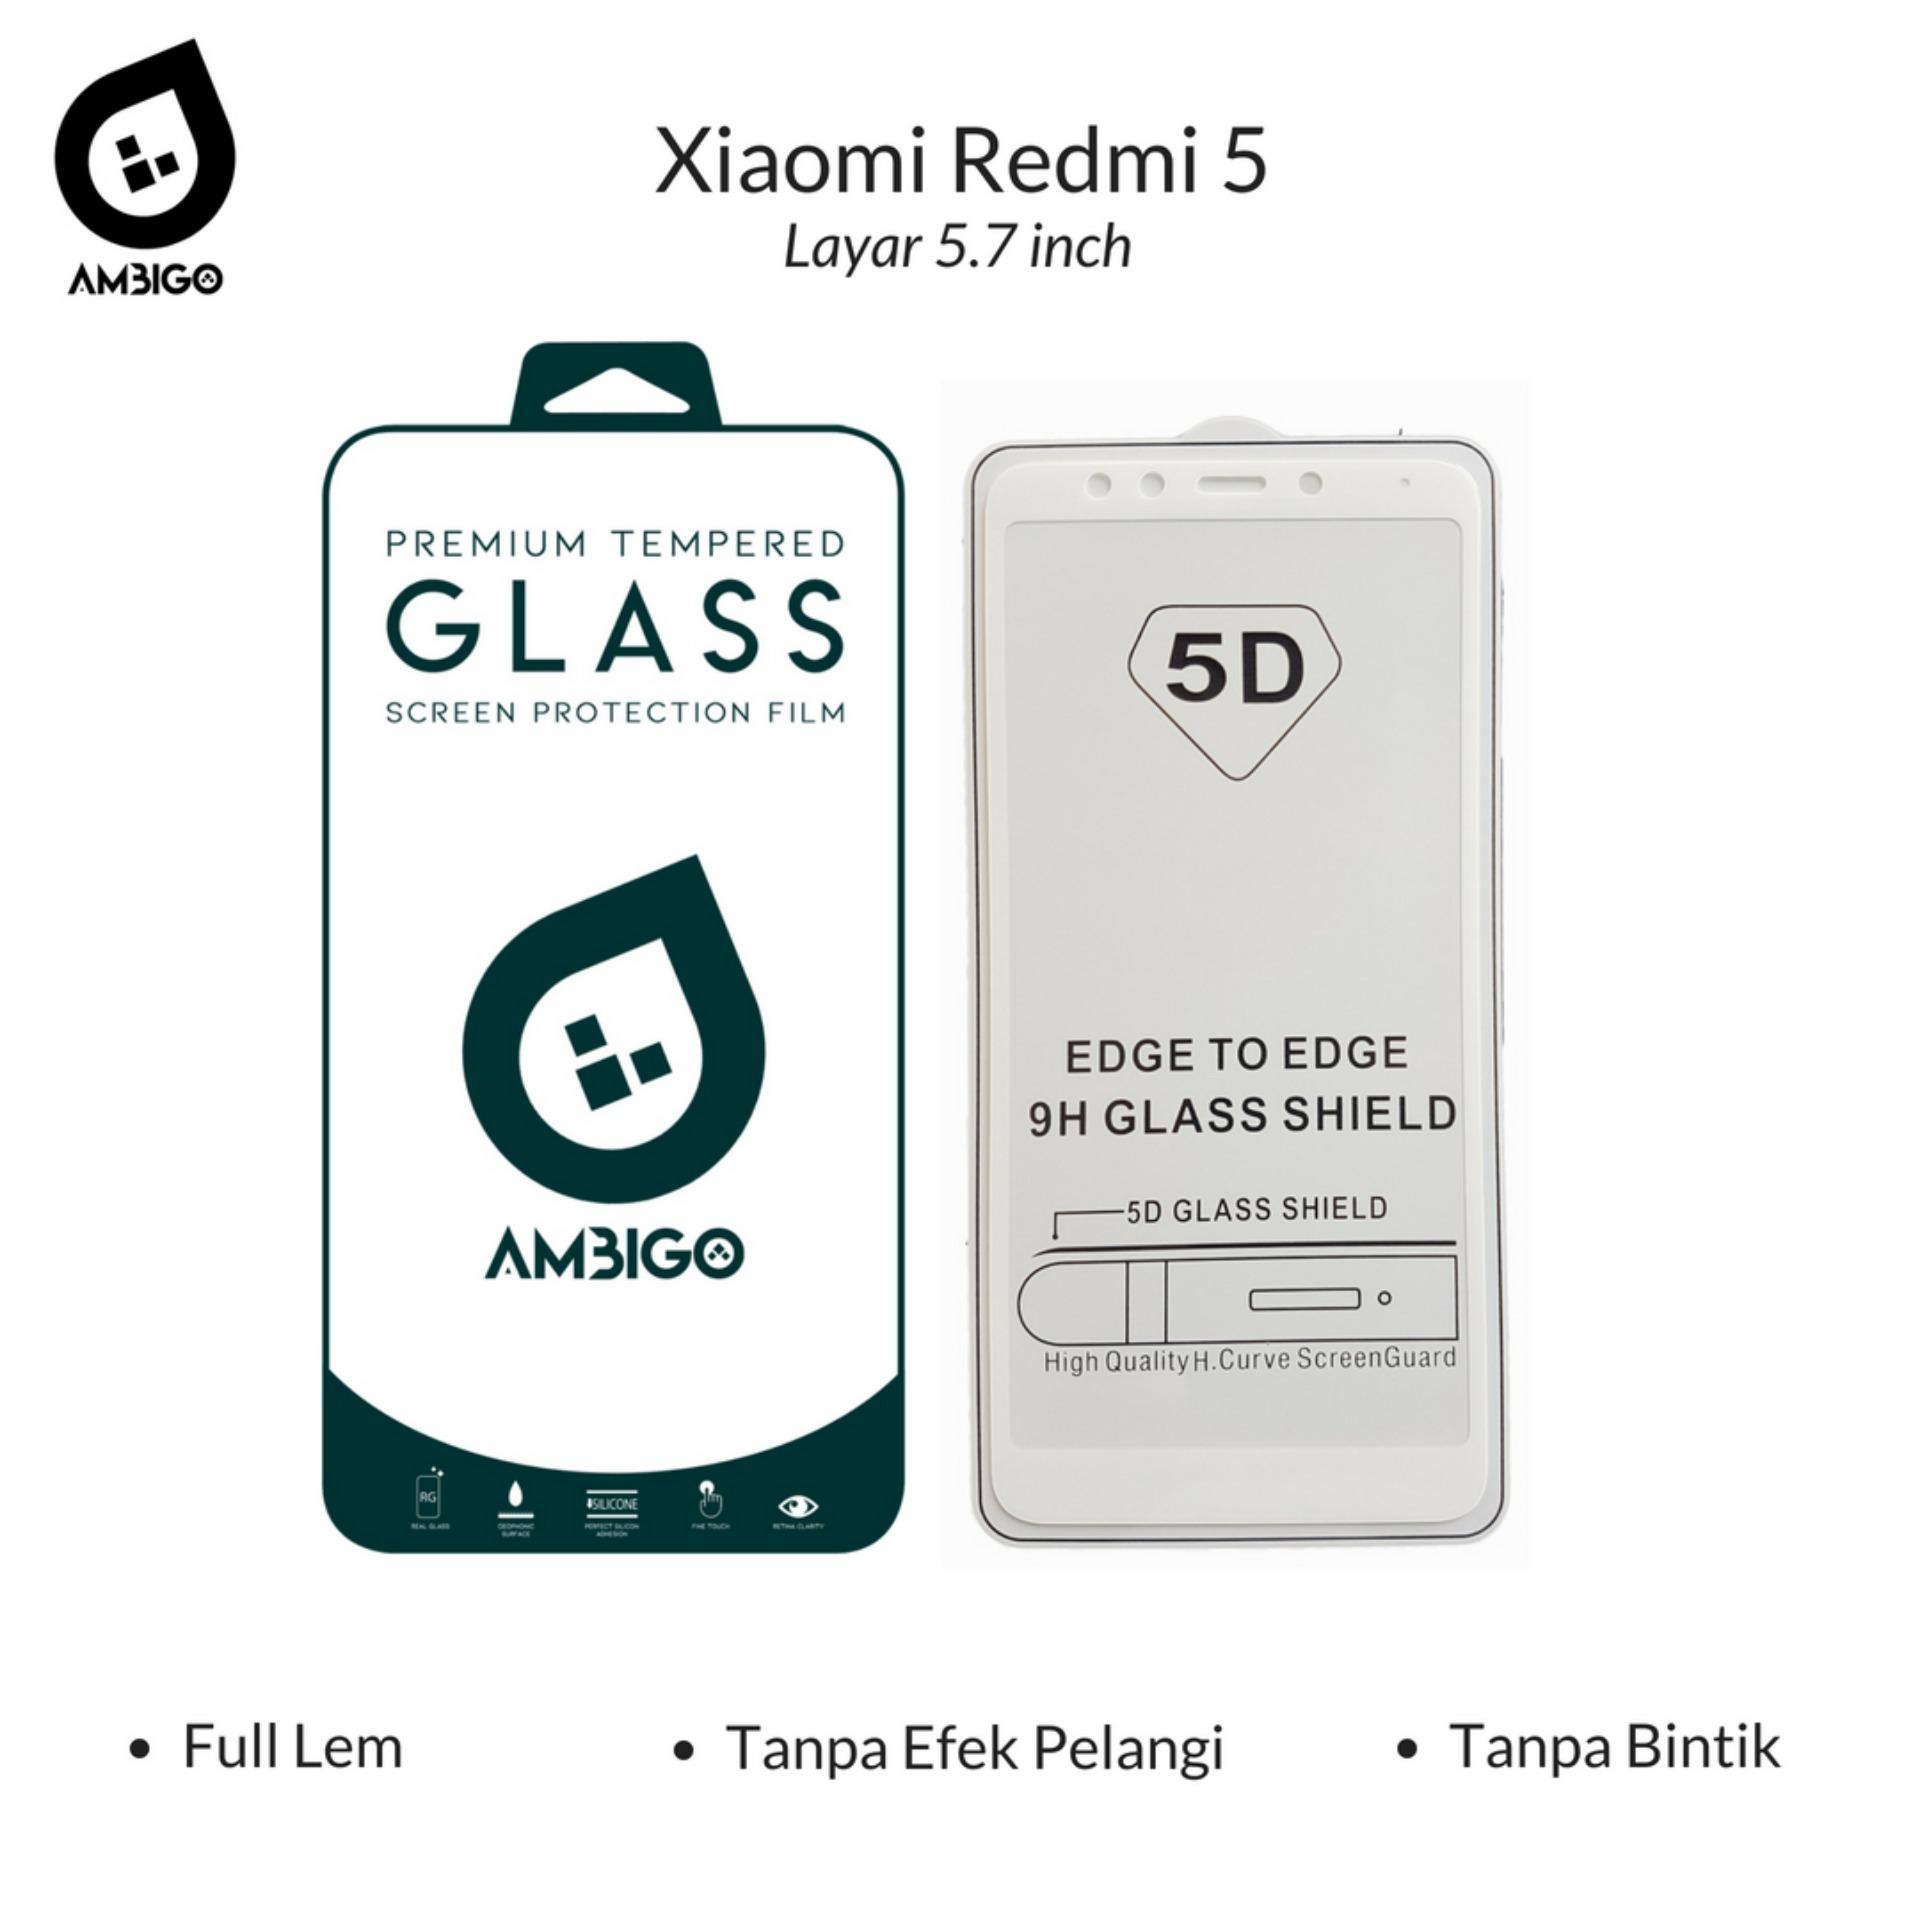 Accessories Hp Ambigo Tempered Glass 5D Full Cover Warna / Anti Gores Kaca Full Lem UntukXiaomi Redmi 5 ( Layar 5.7 inch ) - White